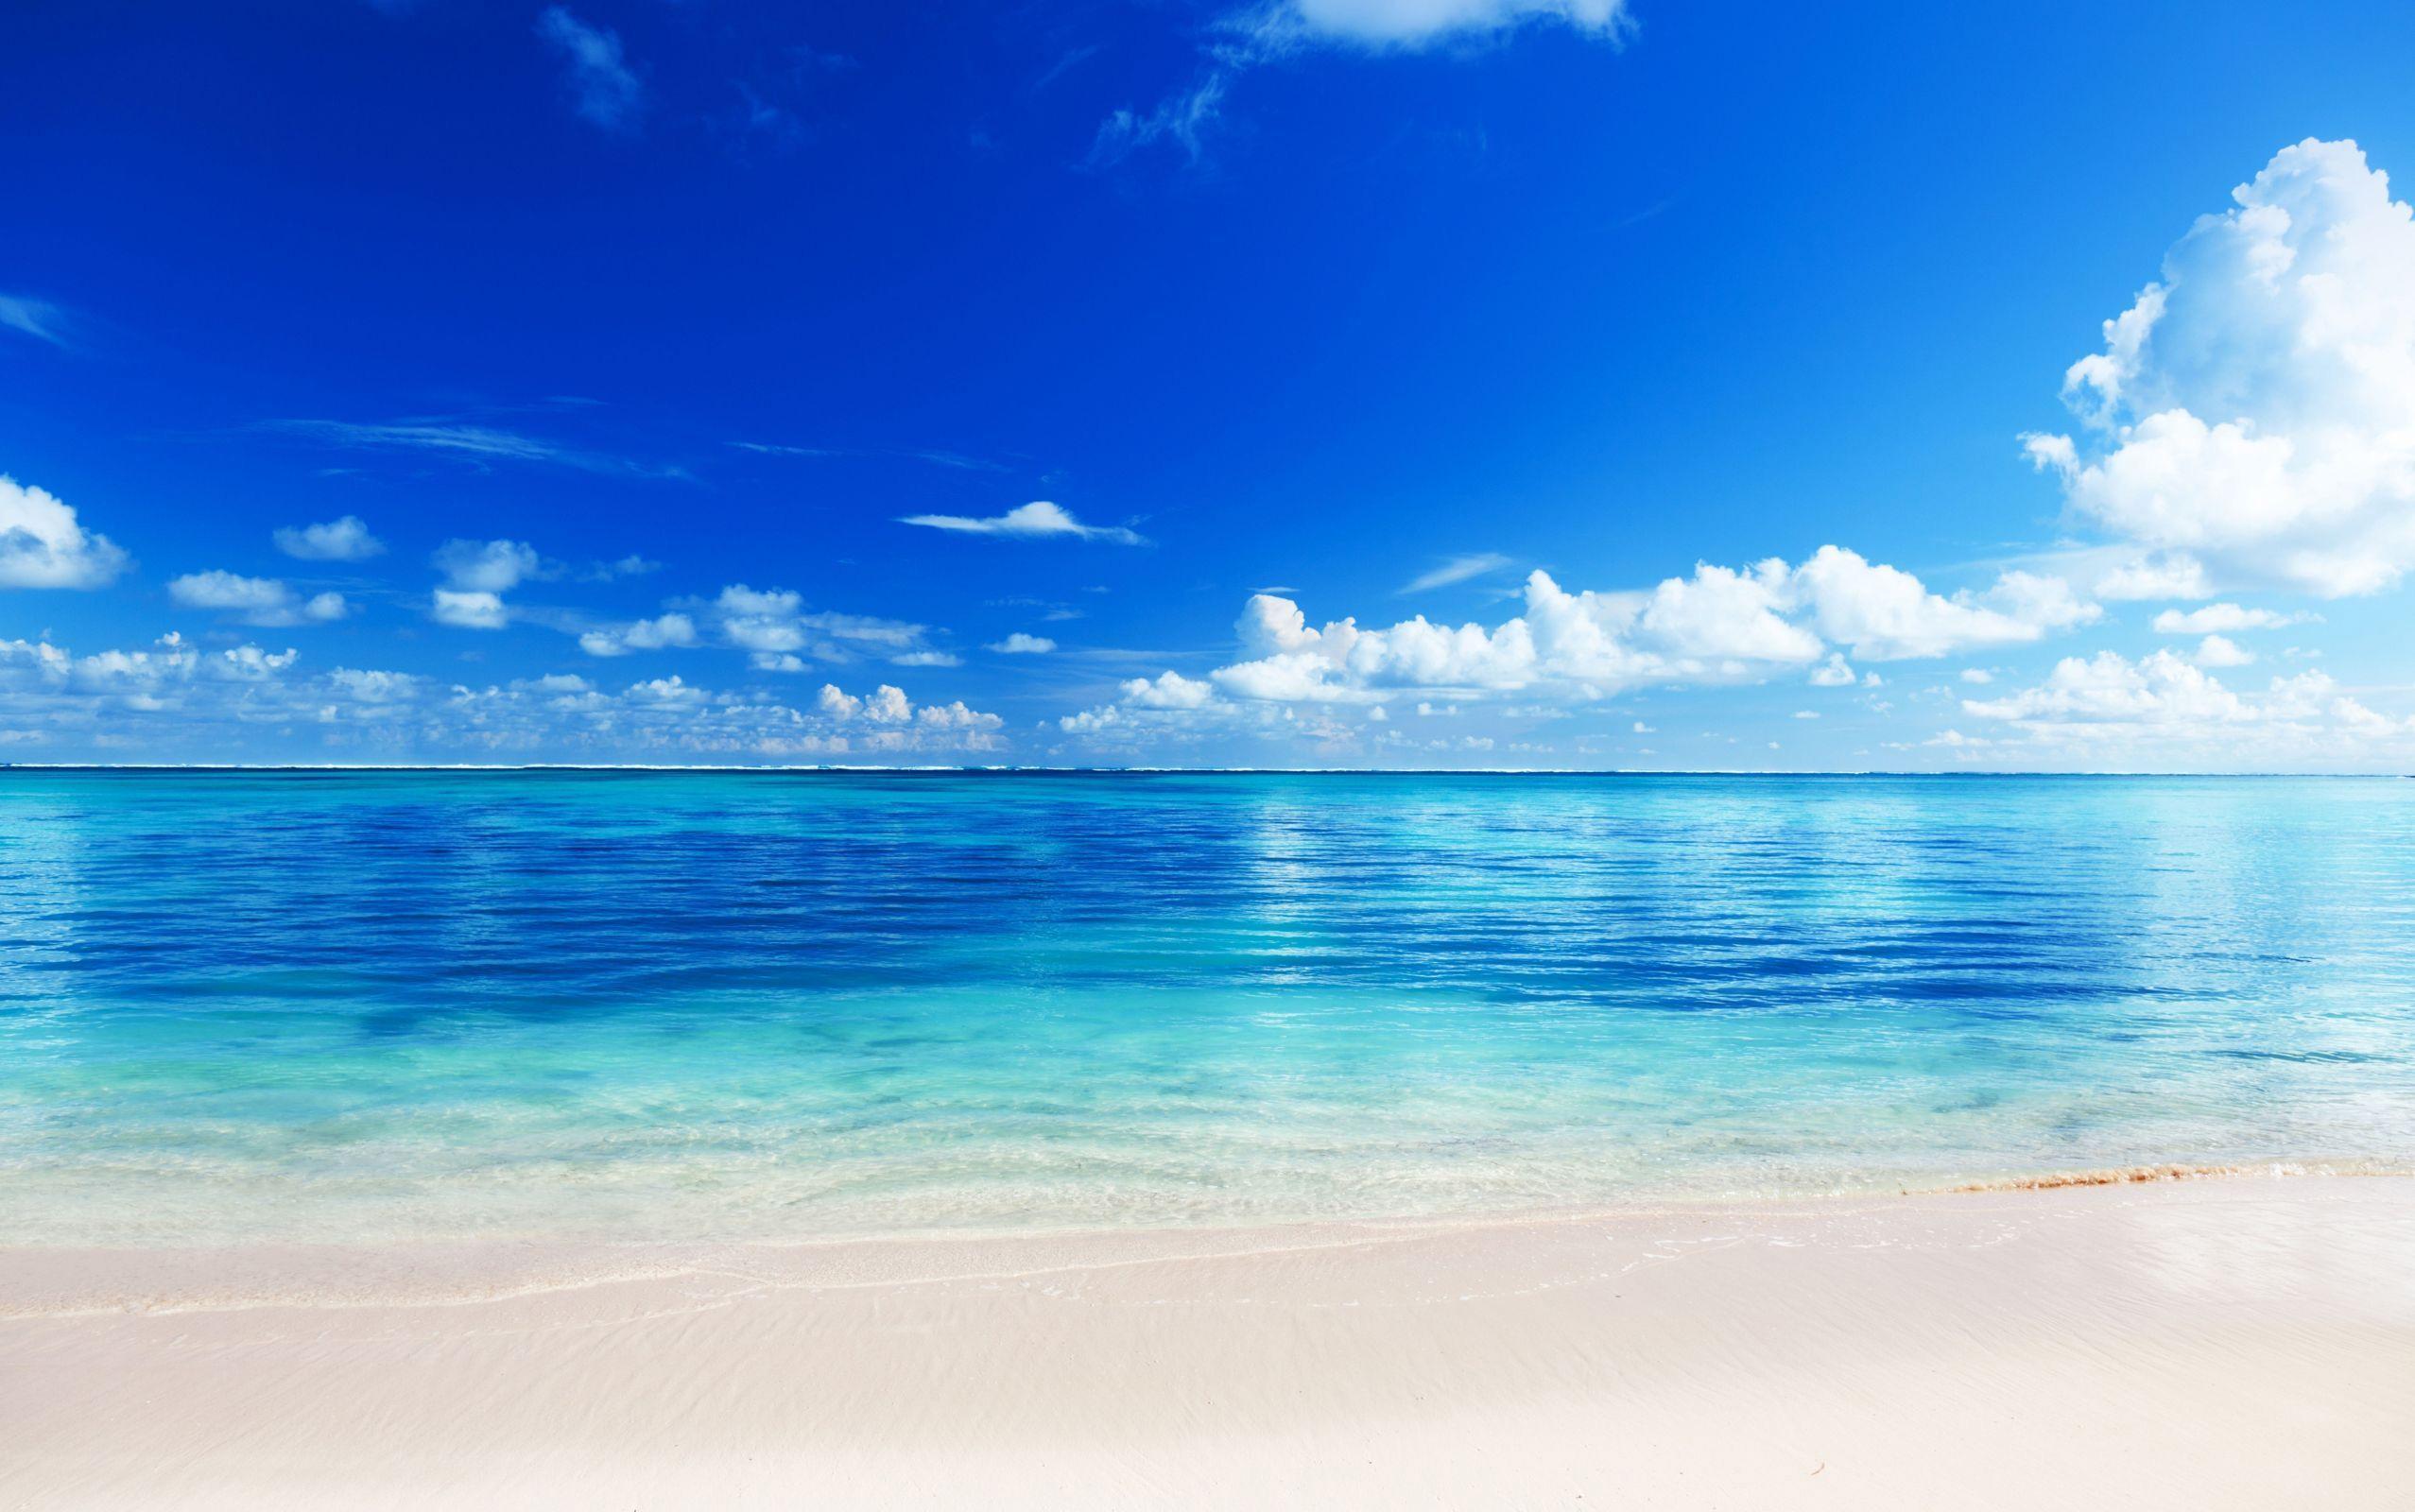 Beach Png - Beach PNG